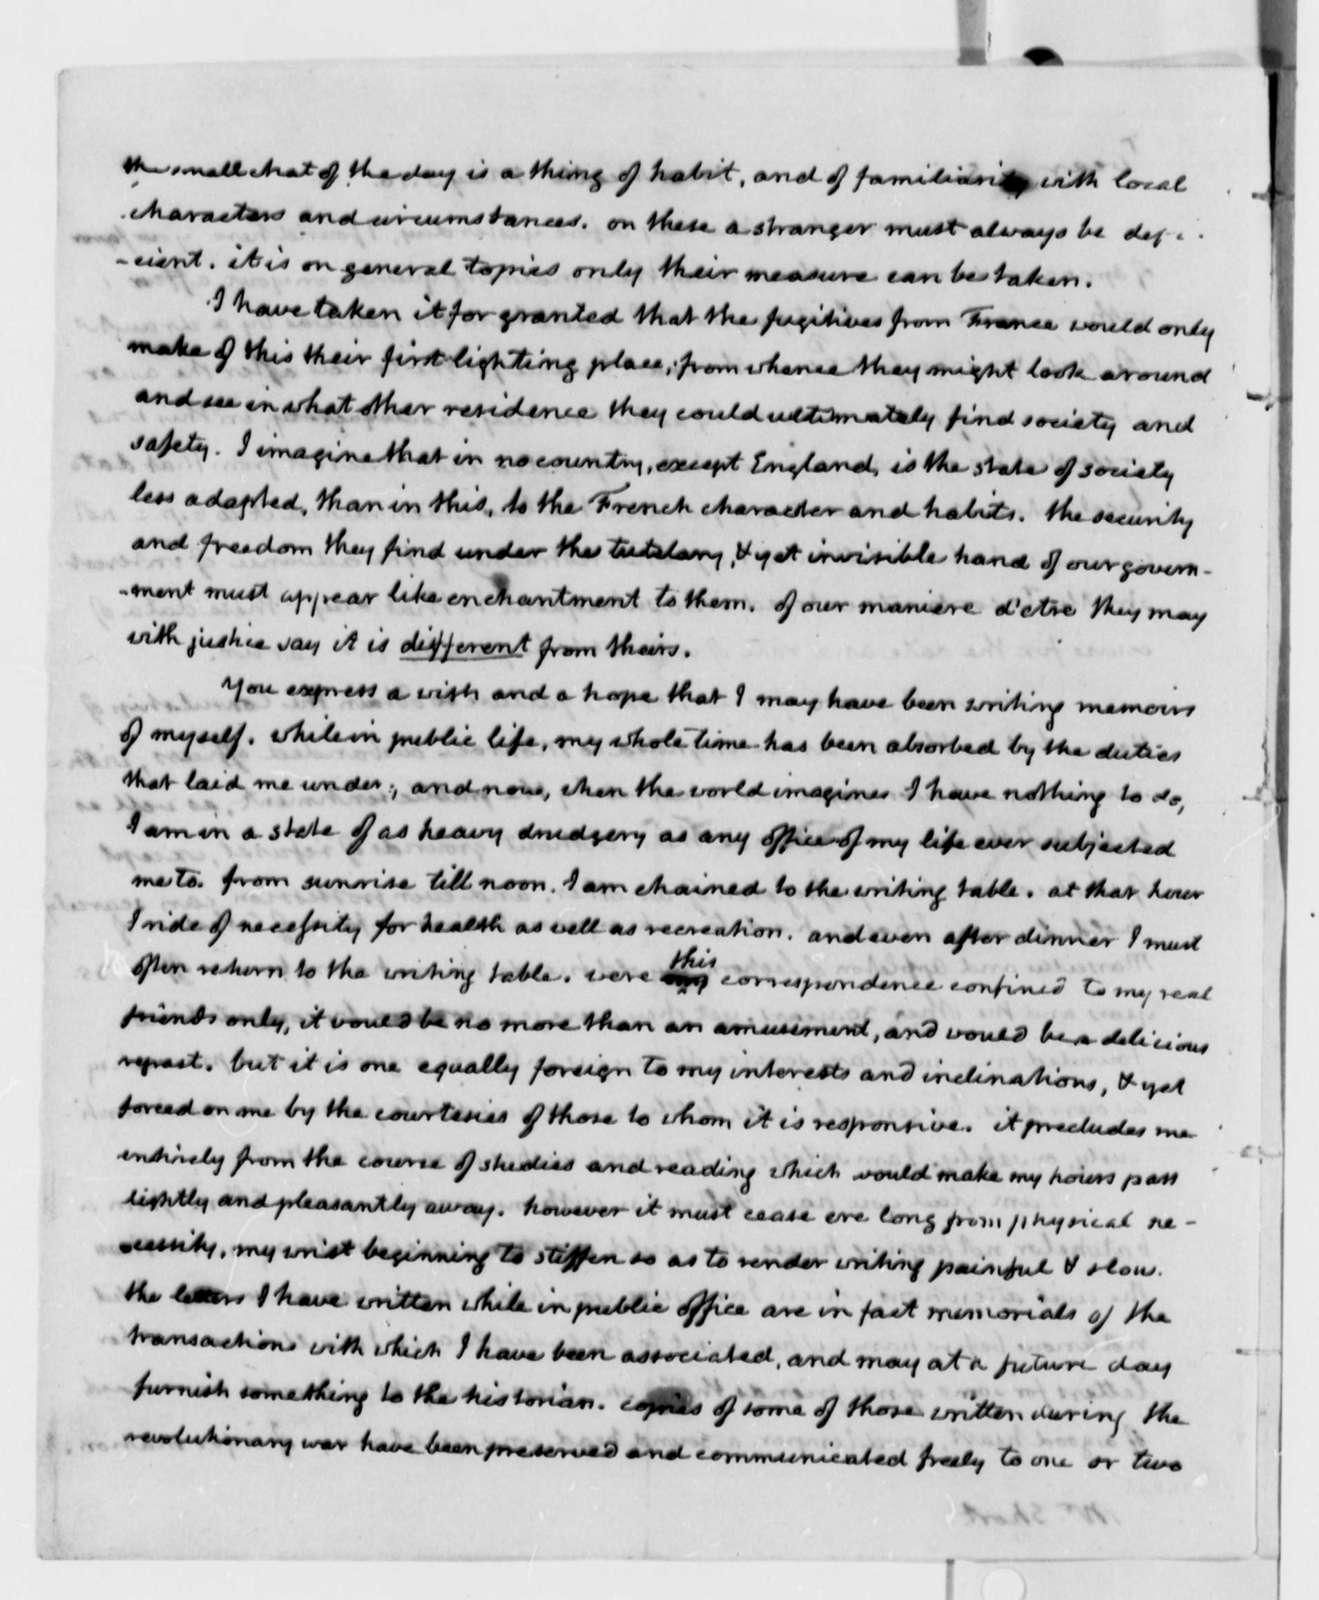 Thomas Jefferson to William Short, May 5, 1816